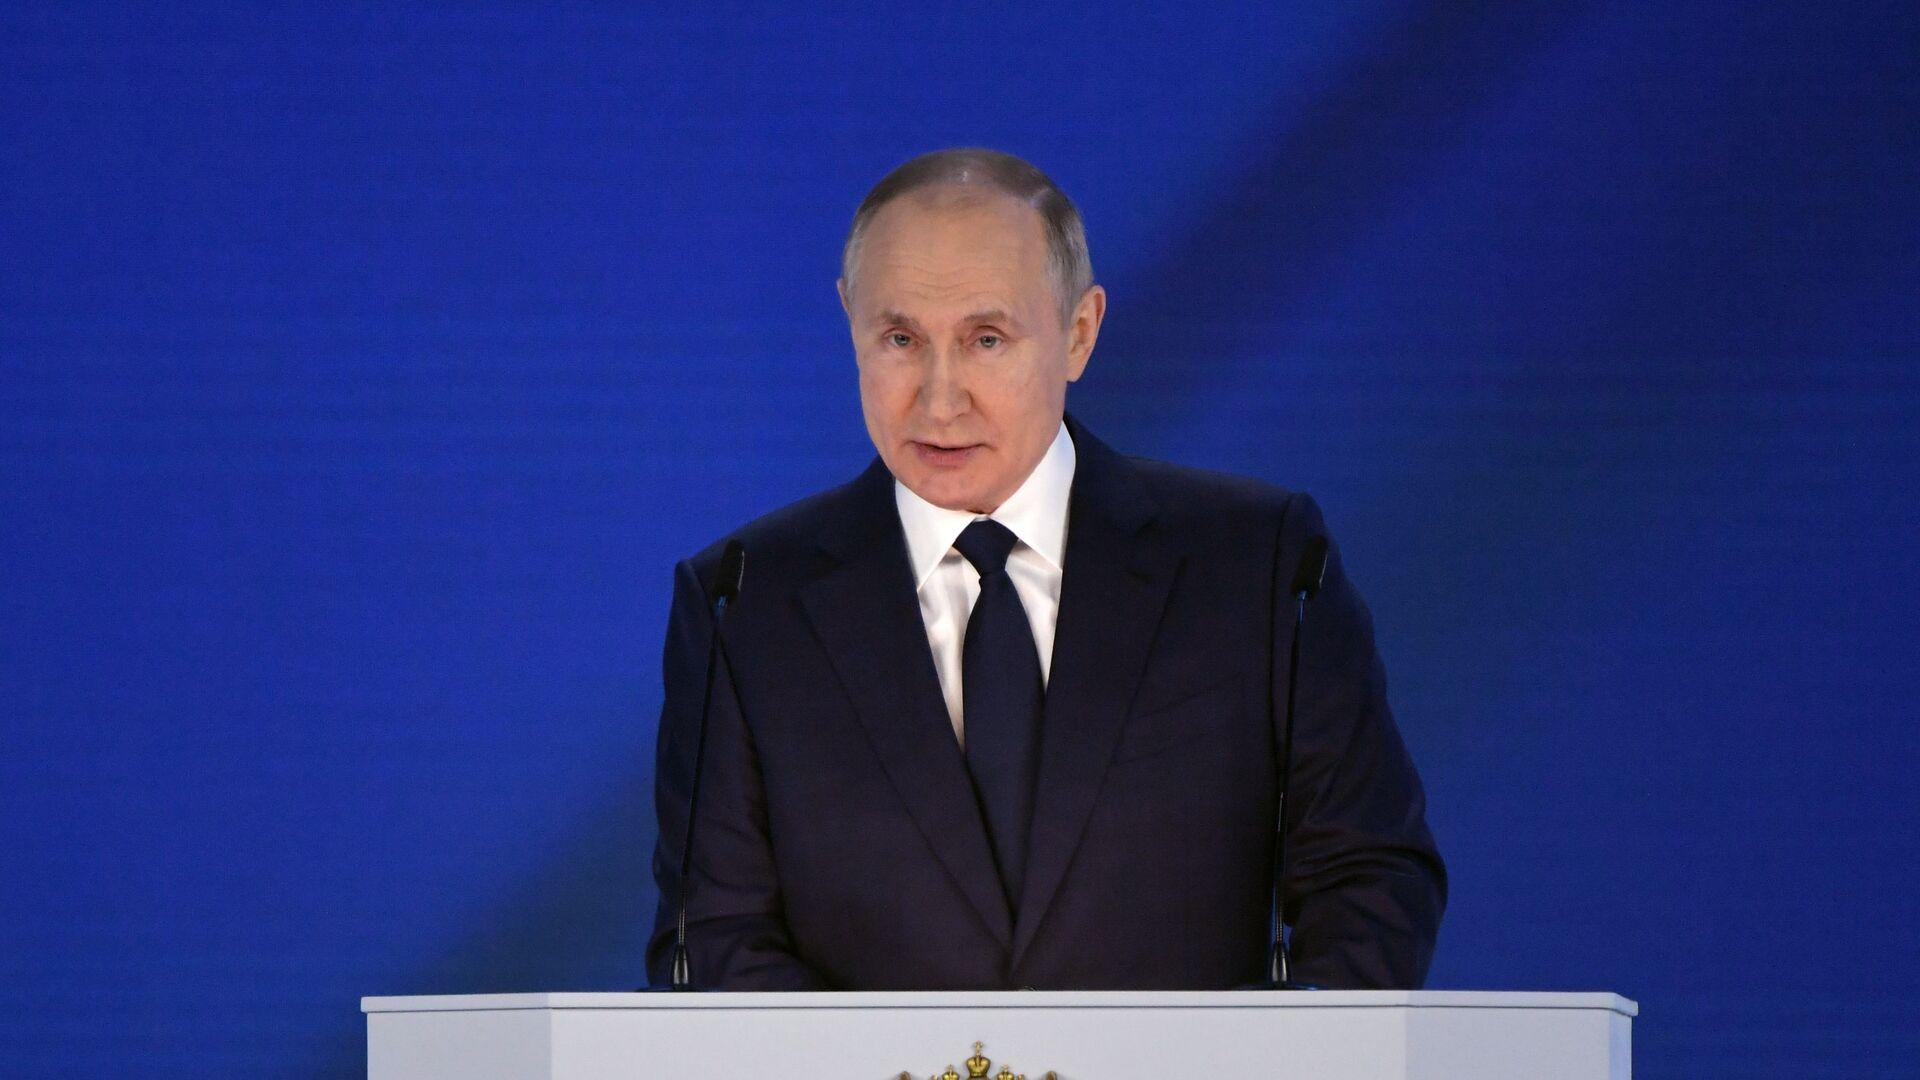 Il discorso di Vladimir Putin all'Assemblea federale - Sputnik Italia, 1920, 21.04.2021